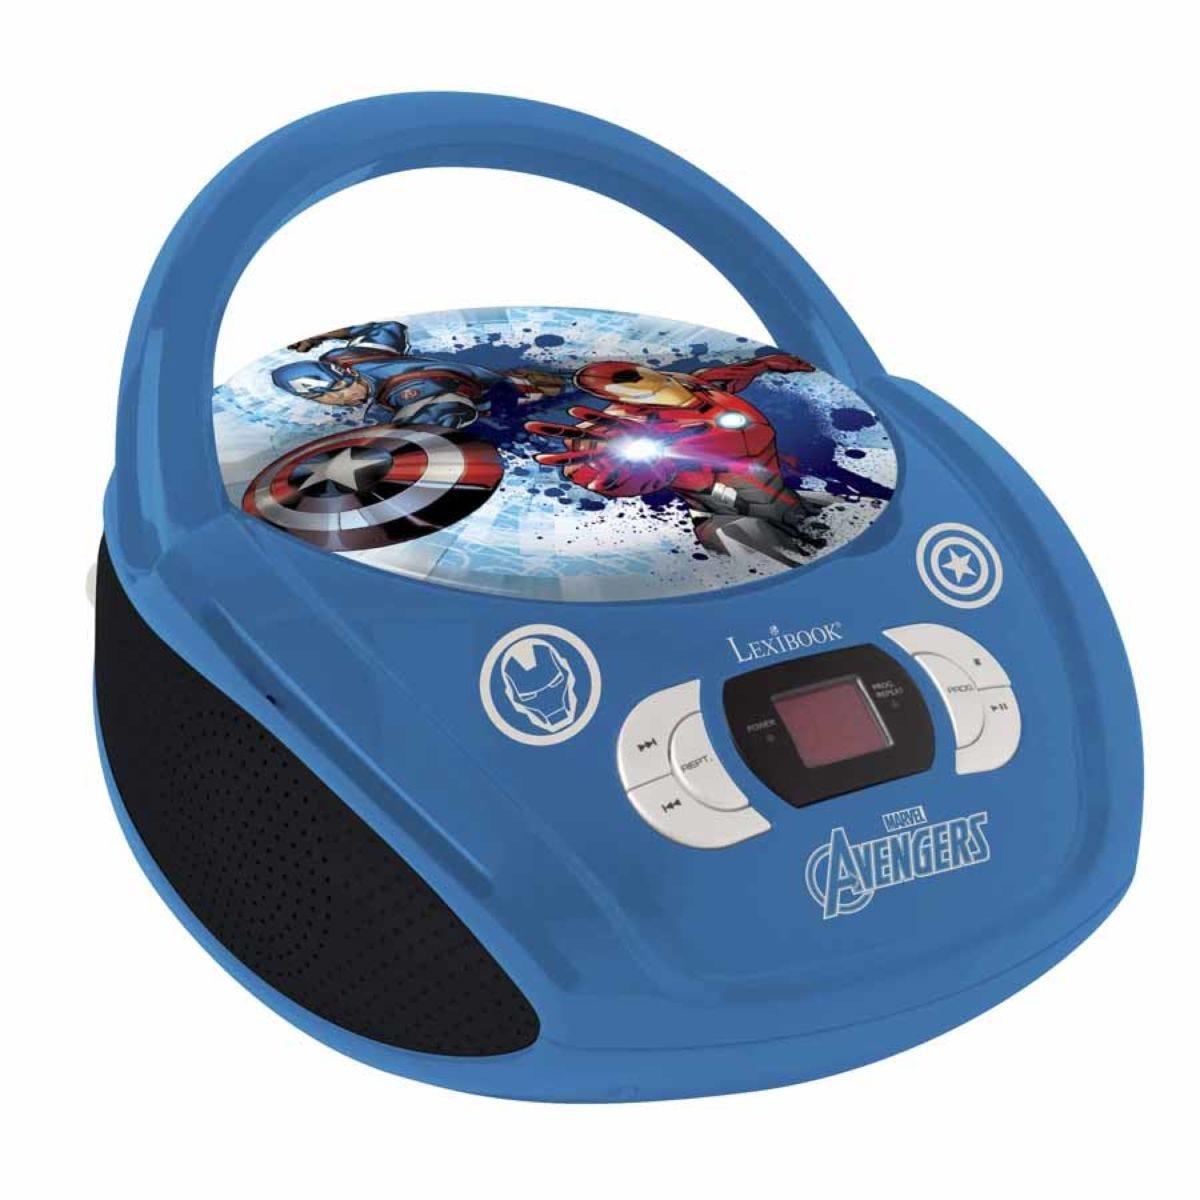 Lexibook Avengers Radio and CD Player